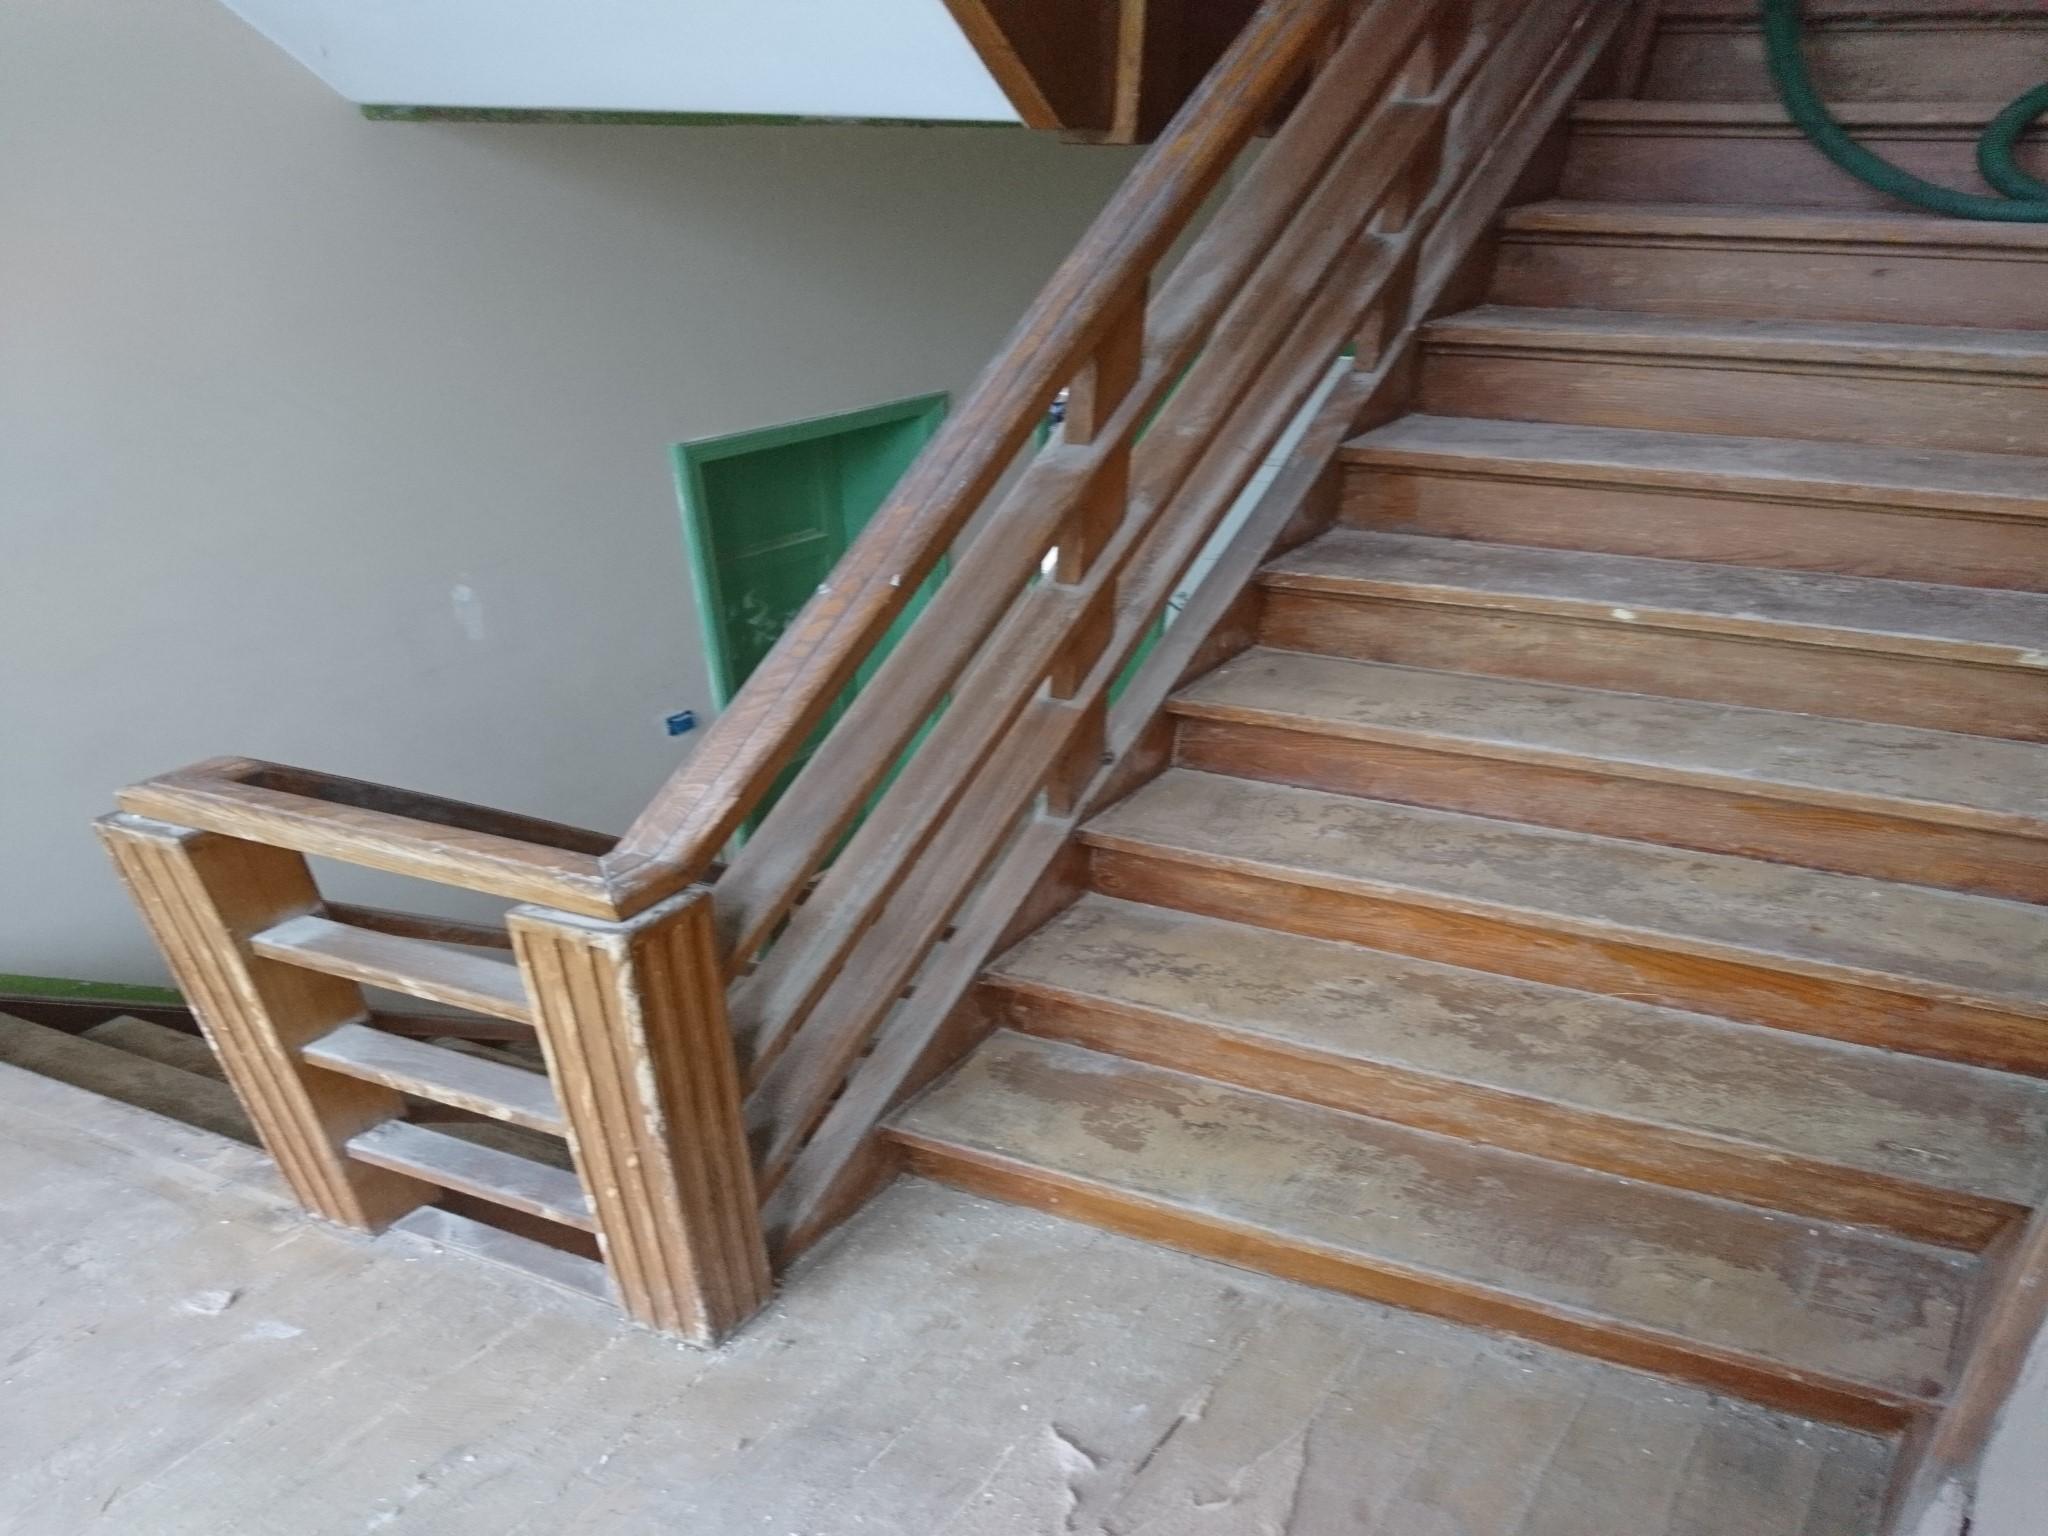 Renovation Escalier Nord Pas De Calais poncage escaliers a hazebrouck st omer bailleul dunkerque